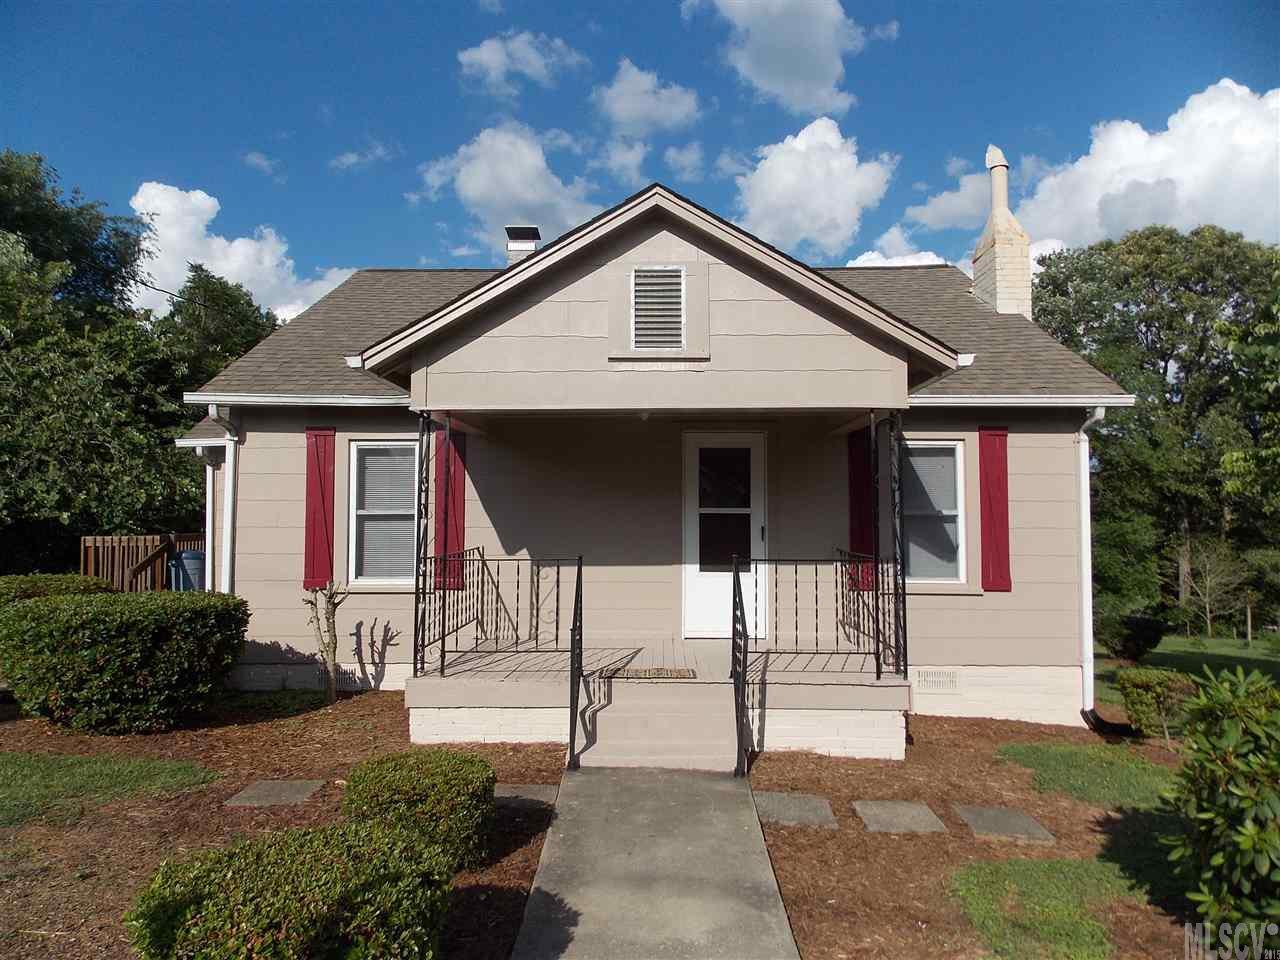 Real Estate for Sale, ListingId: 33858517, Lenoir,NC28645